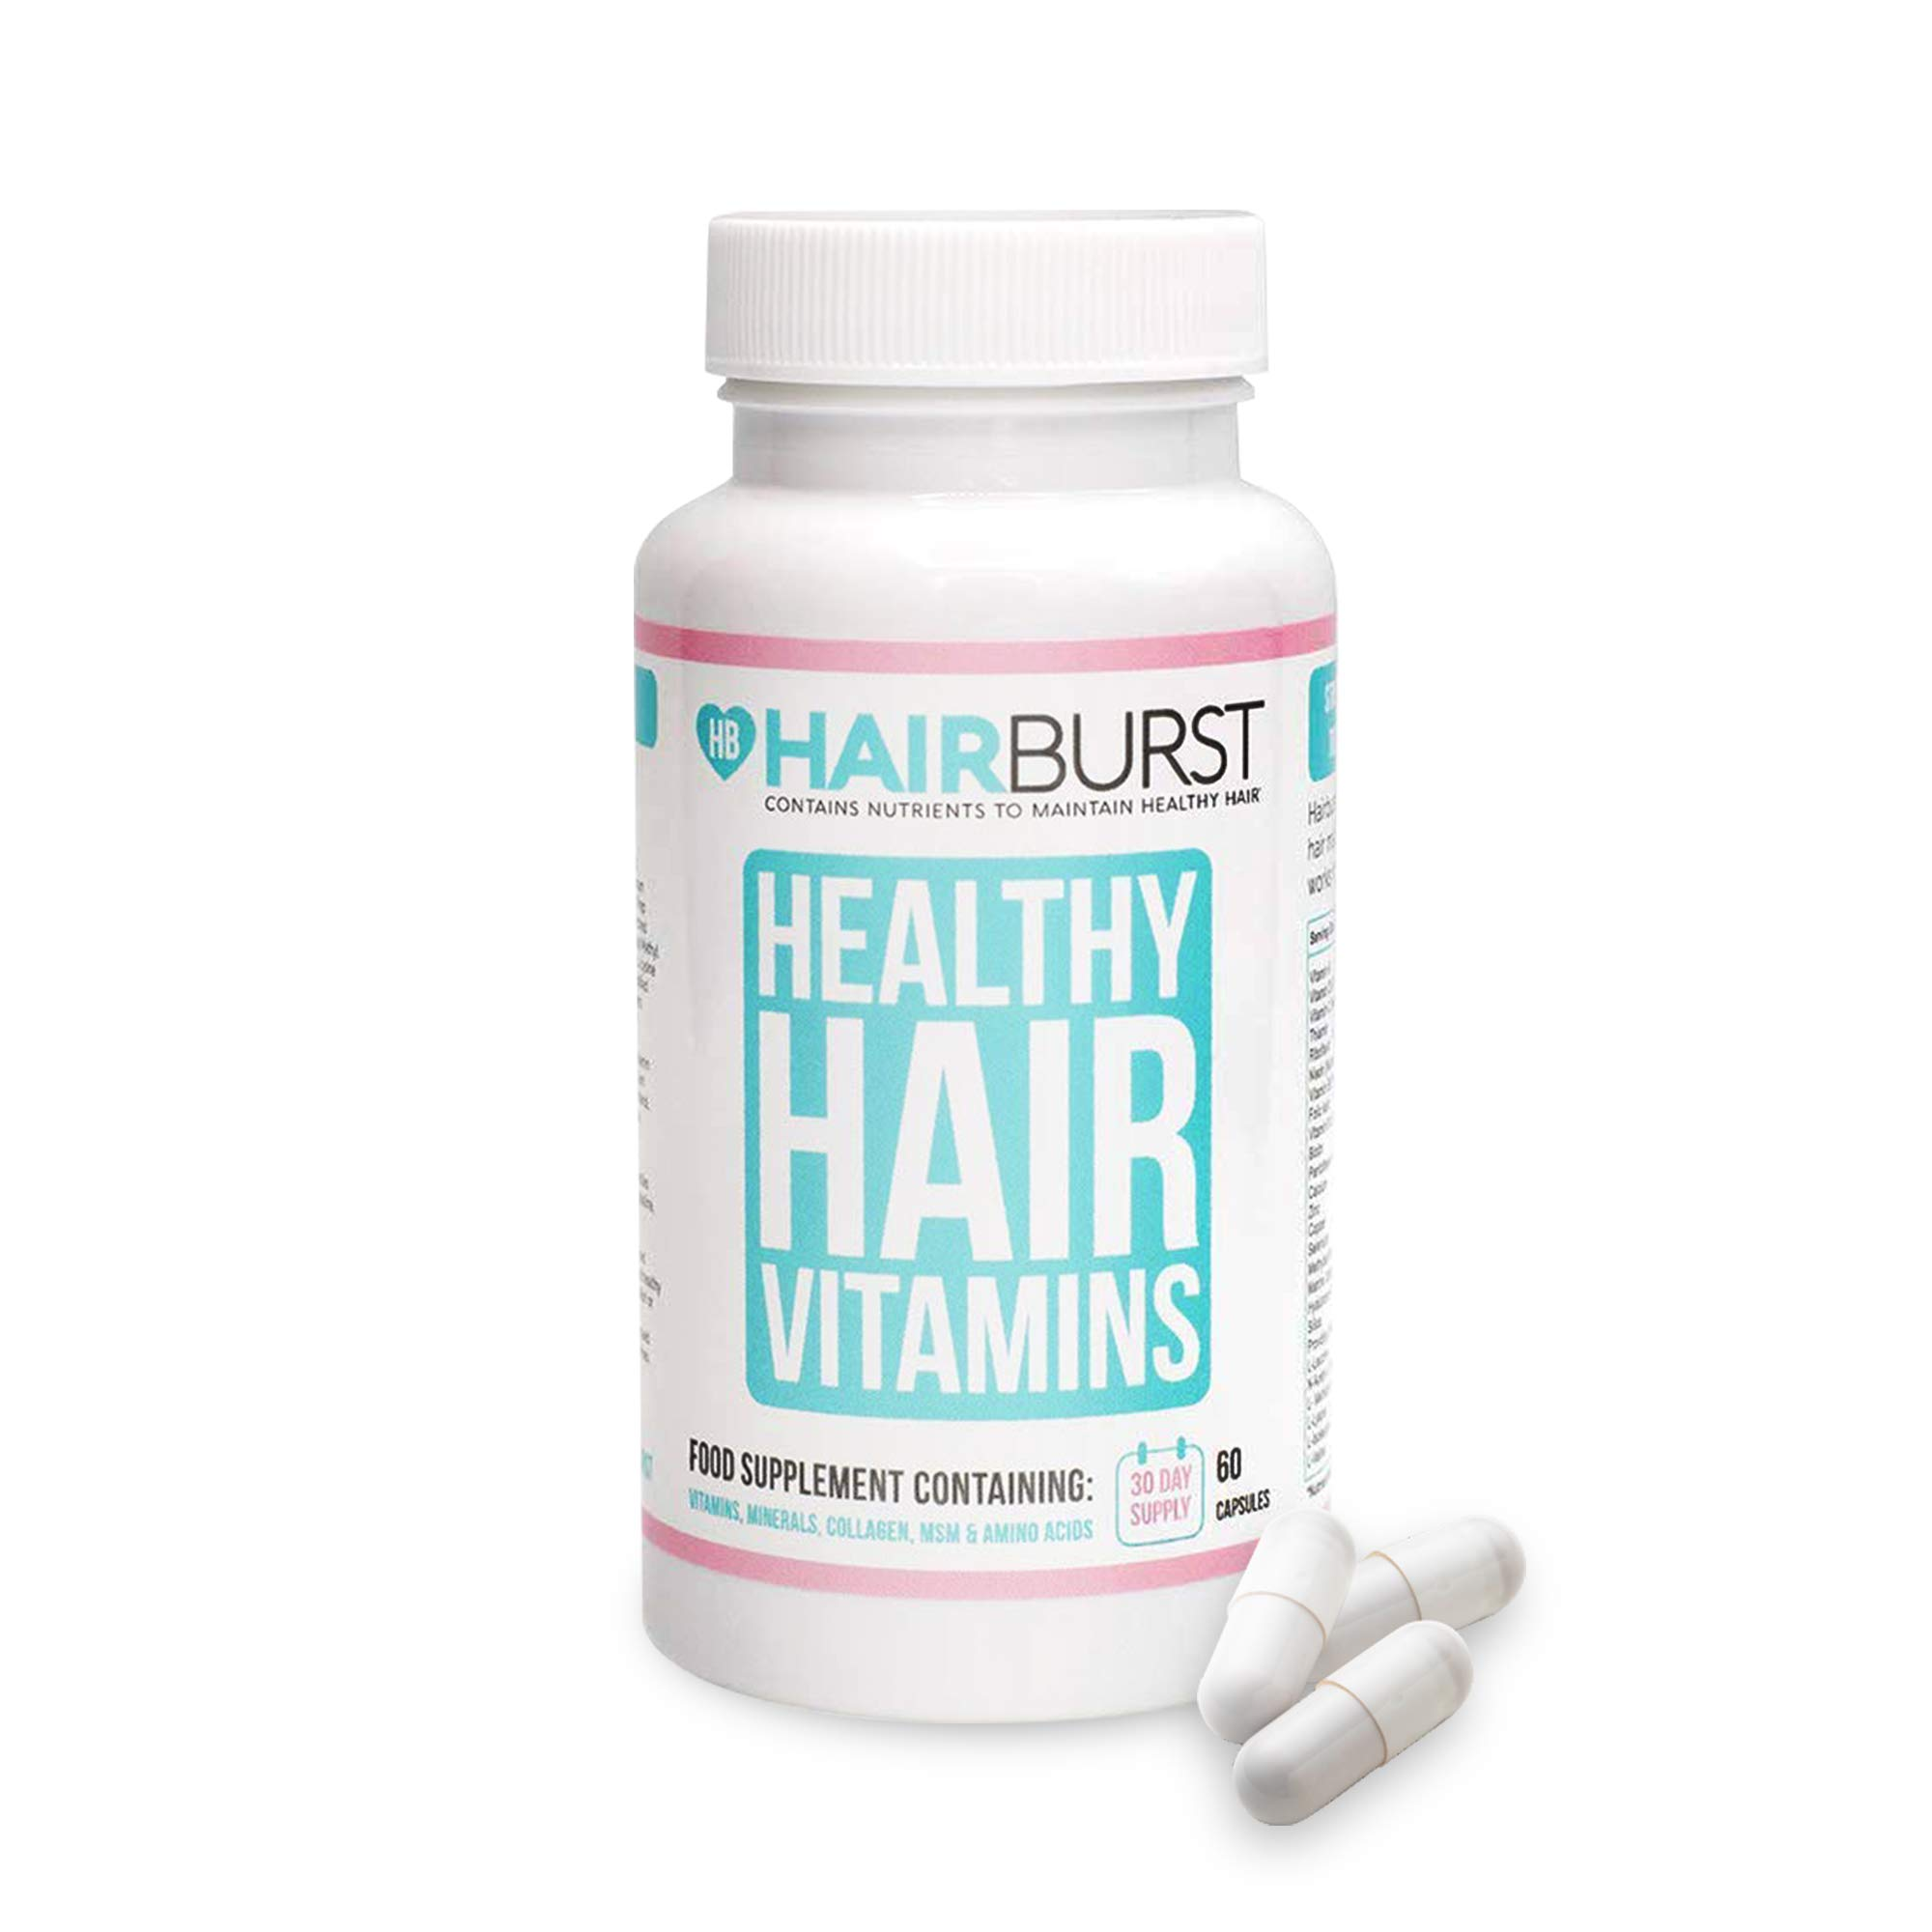 Hair Growth Vitamins - Biotin Anti Hair Loss Supplement for Thinning Hair - Hair Tablets for Women - Hair Regrowth Multivitamins Pills - Grow Longer Stronger Healthy Hair Capsules - 1 Month Hairburst